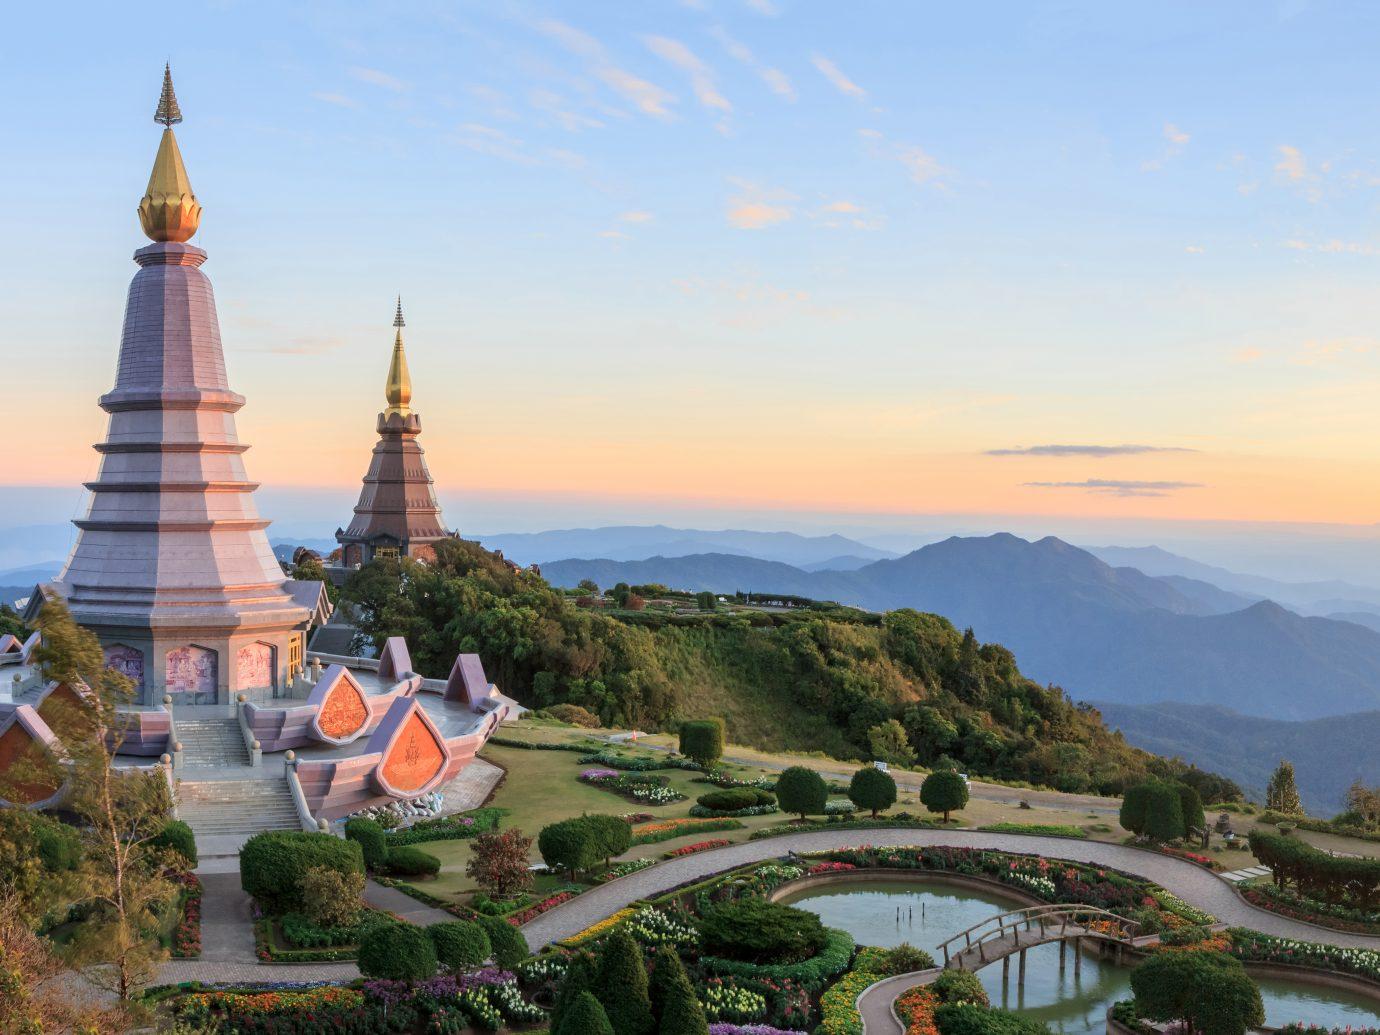 Beautiful sunset at two pagoda Doi Inthanon National Park, Chiang mai, Thailand.